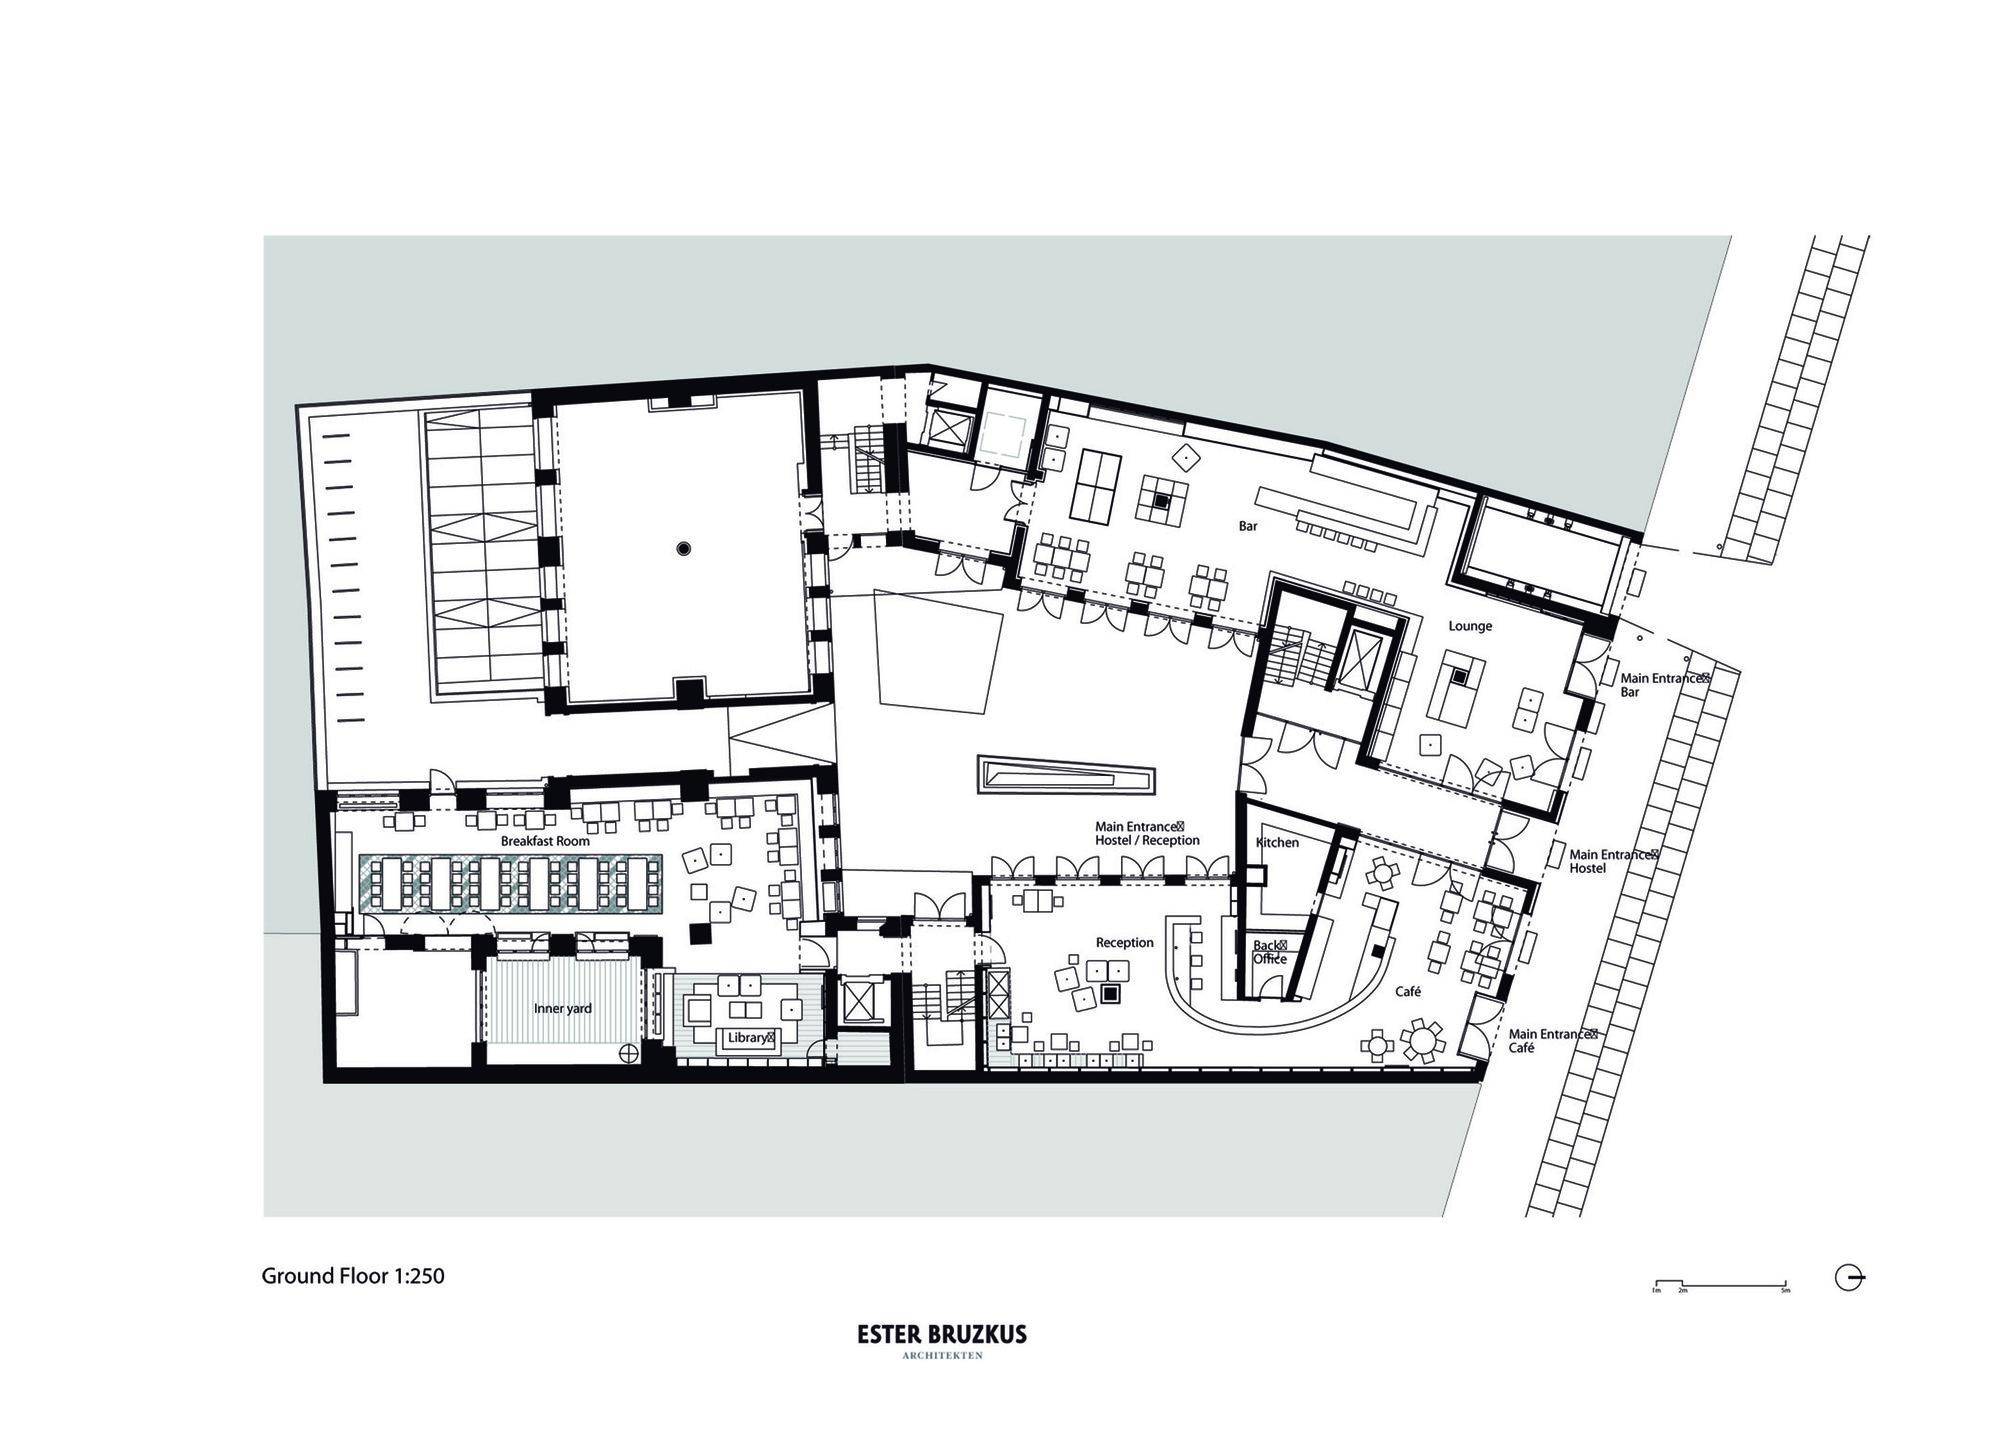 Generator berlin mitte ester bruzkus designagency archdaily Room floor plan generator